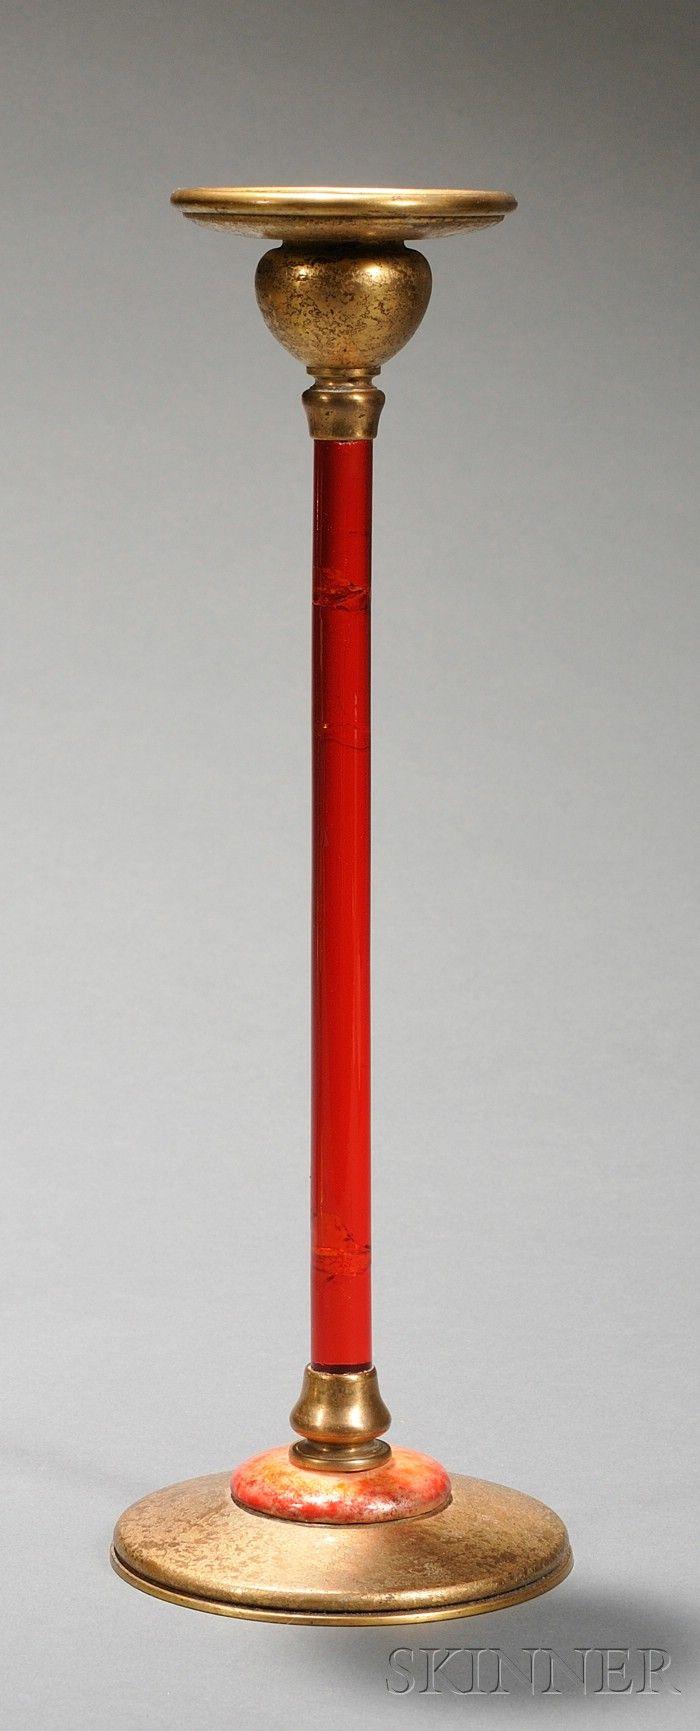 Louis C. Tiffany Furnaces Inc. Candlestick Dore bronze ...